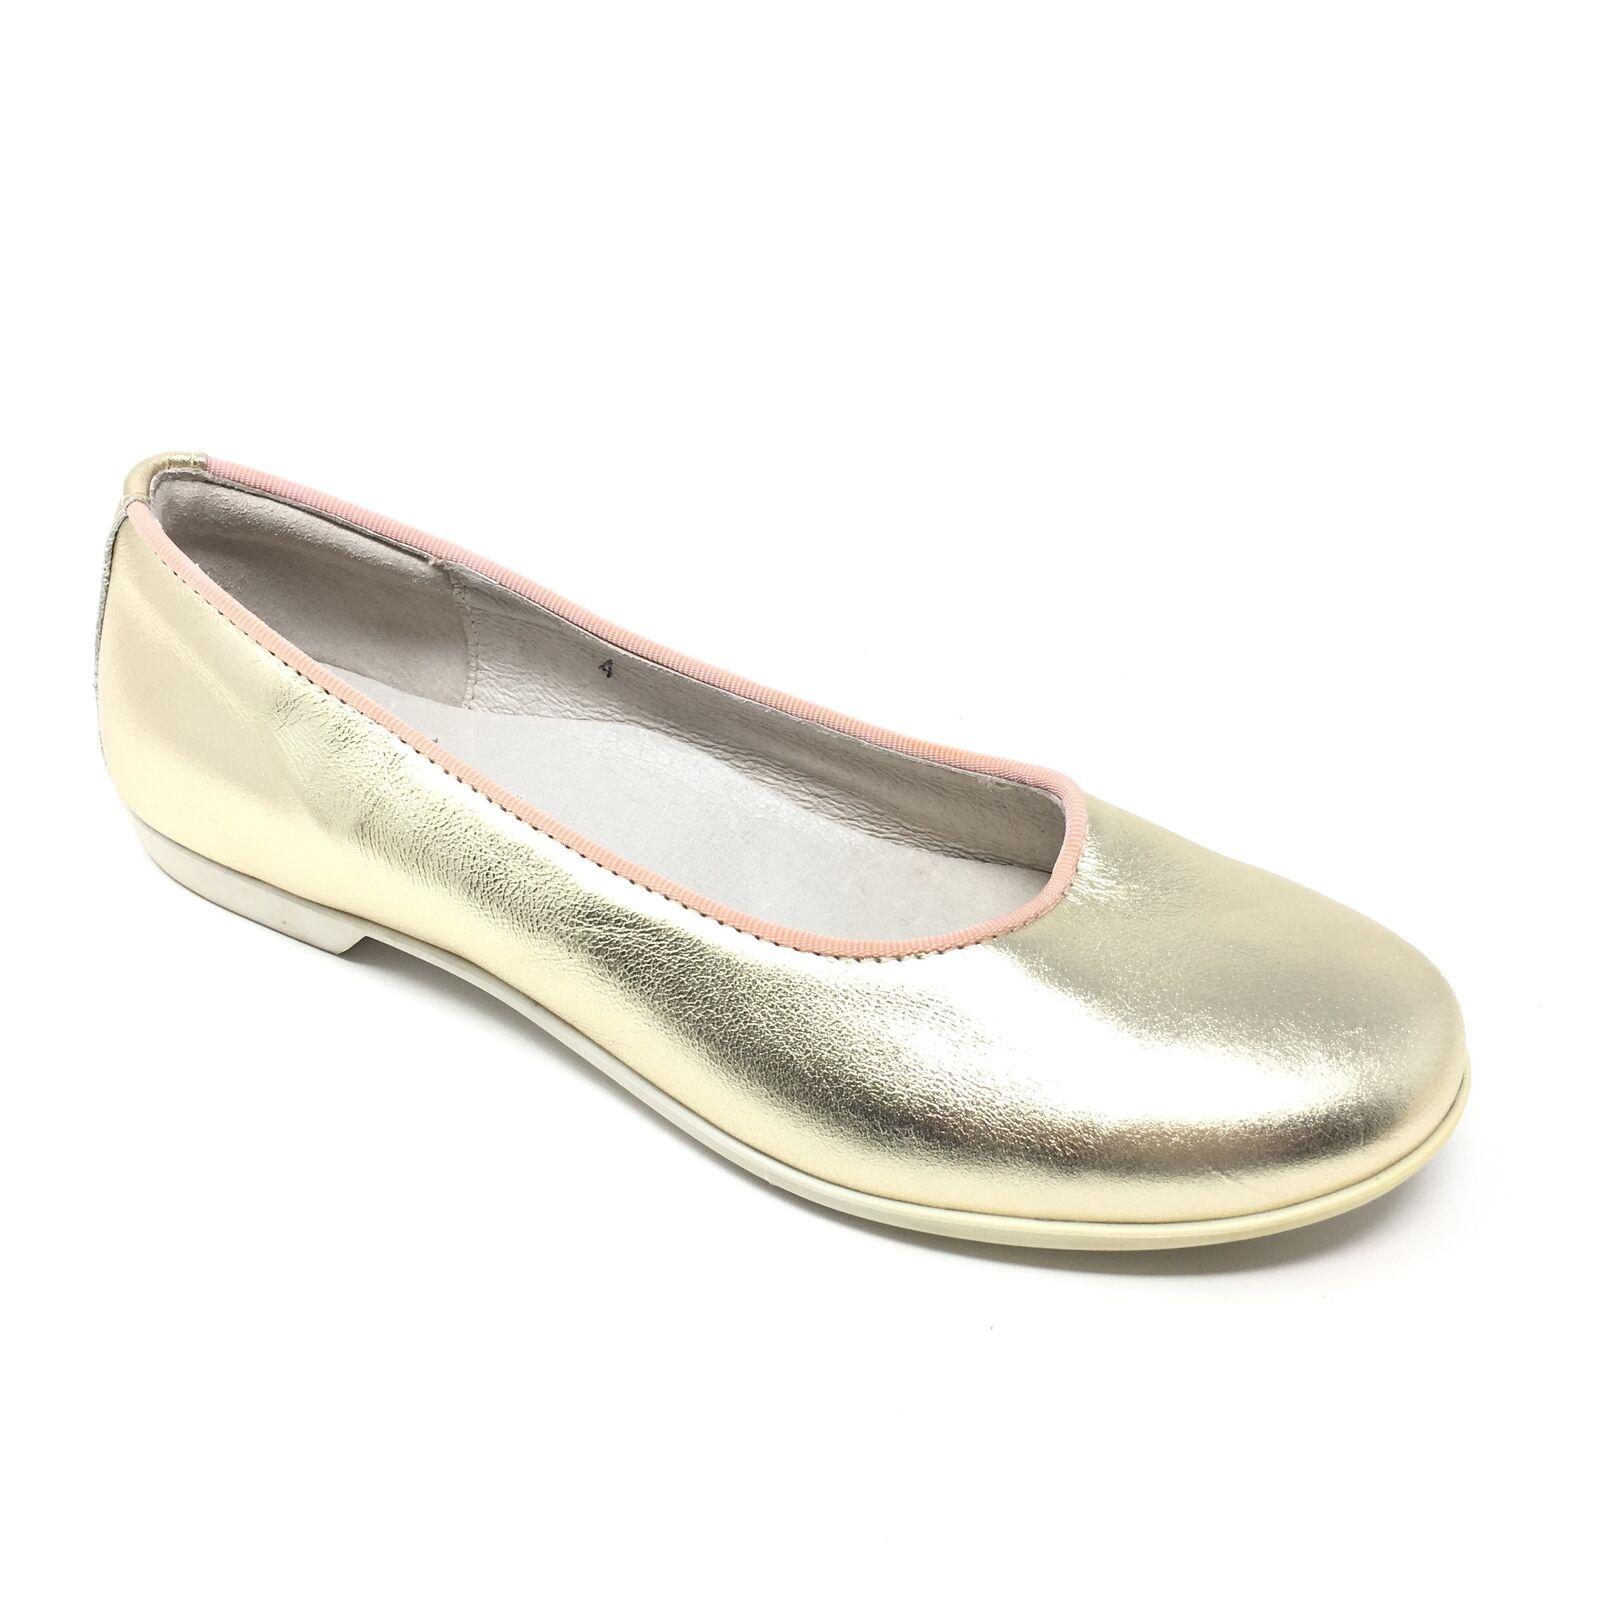 Women's Brooks Bredhers Fleece Ballet Flats shoes Size 35 EU 4.5-5 US gold AB1